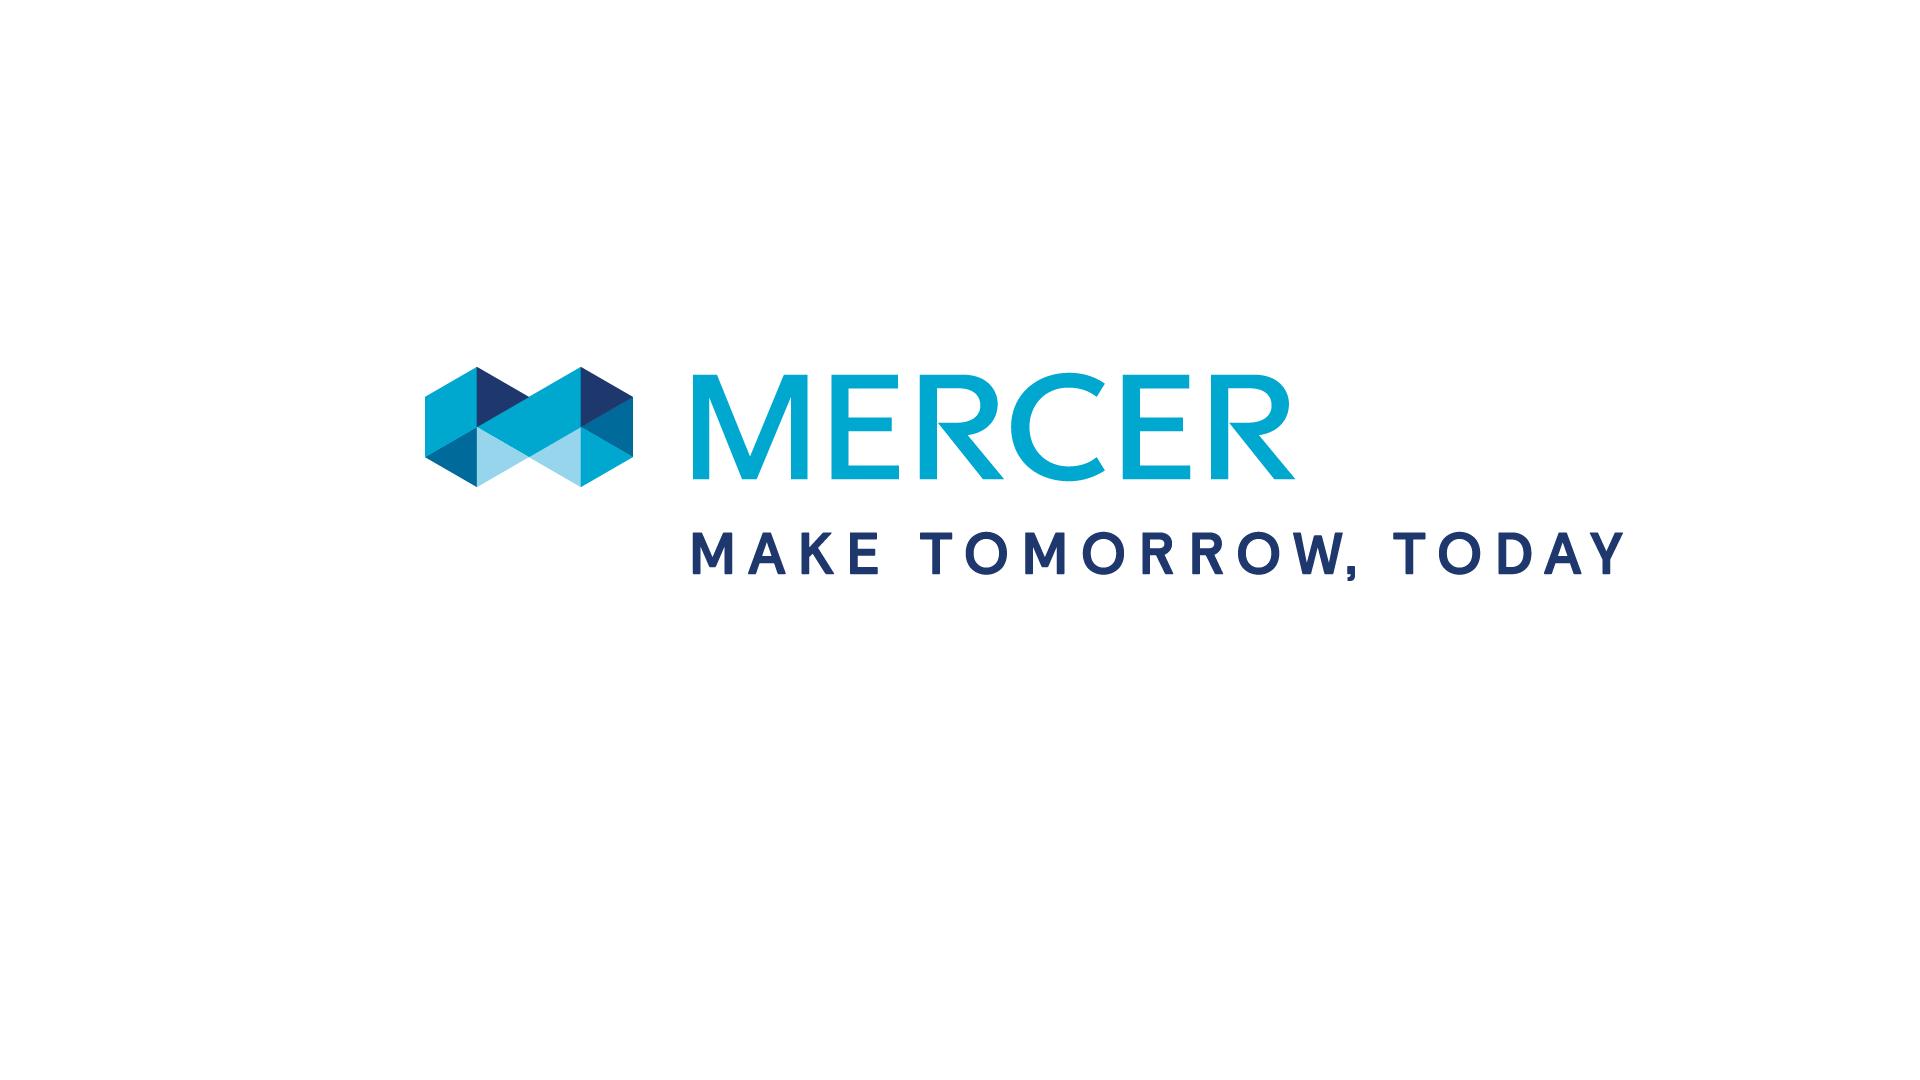 Mercer: When Women Thrive